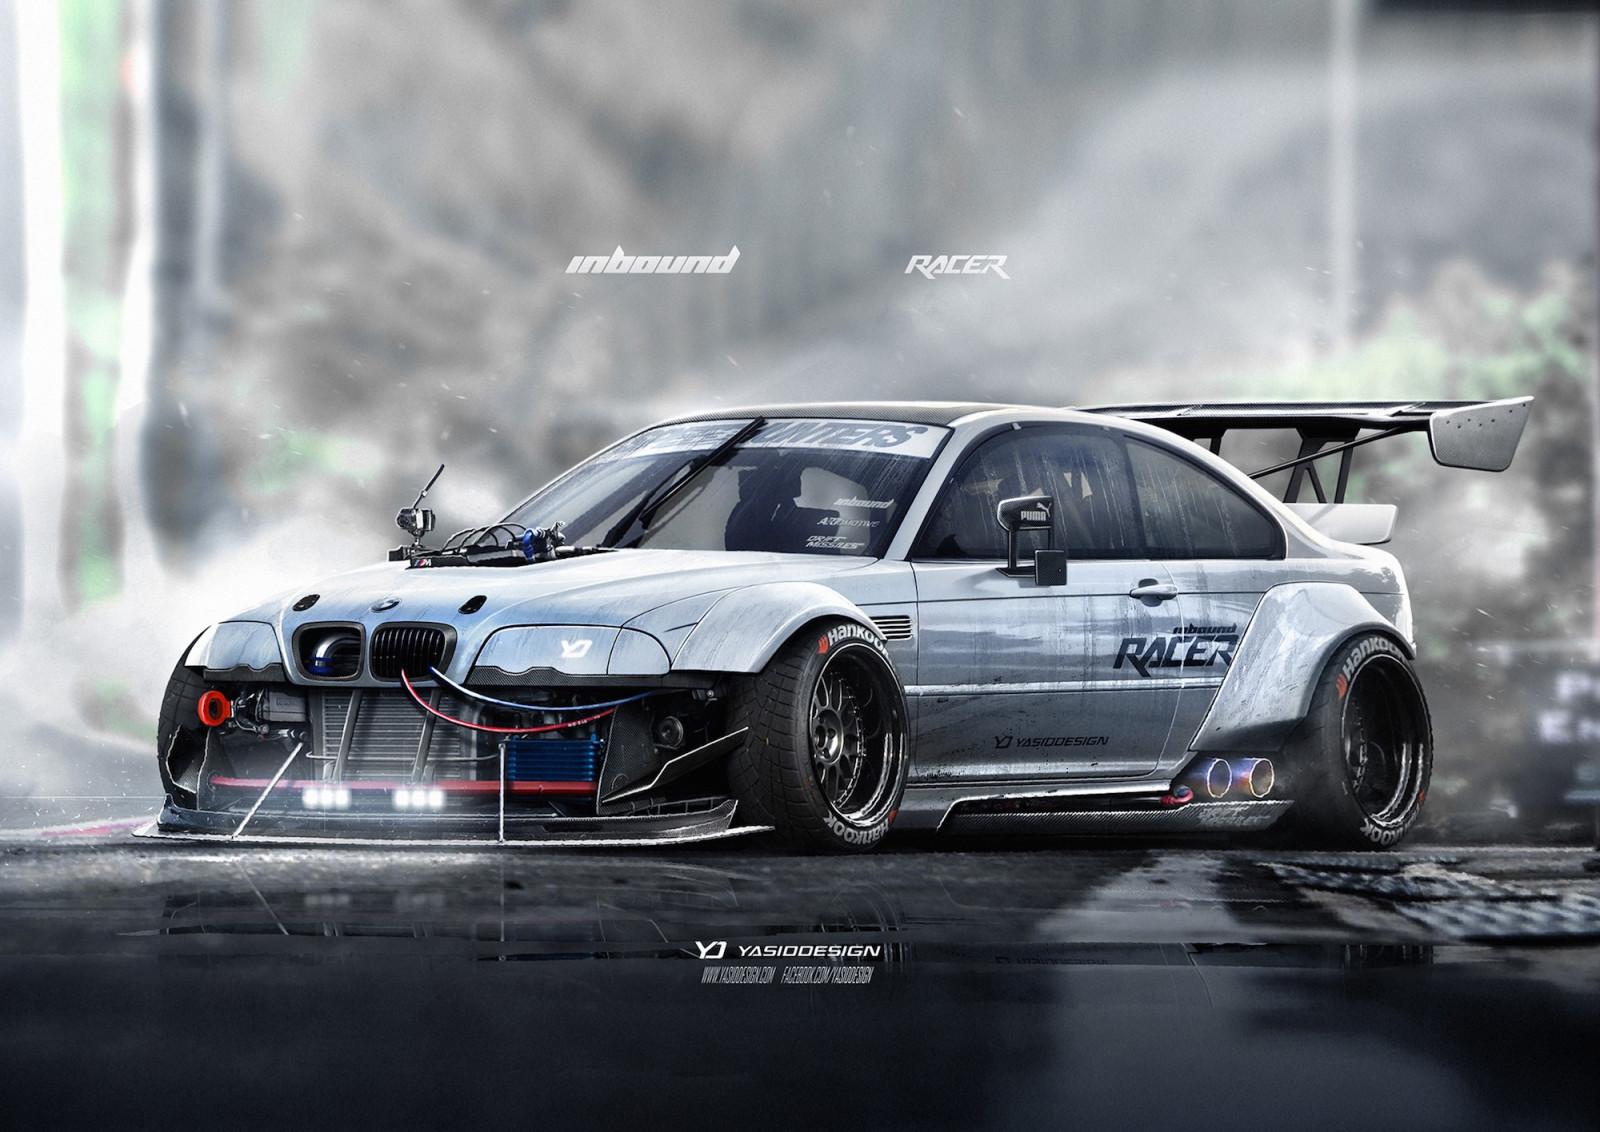 wallpaper race cars render artwork drifting sports car bmw m3 e46 bmw e46 performance. Black Bedroom Furniture Sets. Home Design Ideas